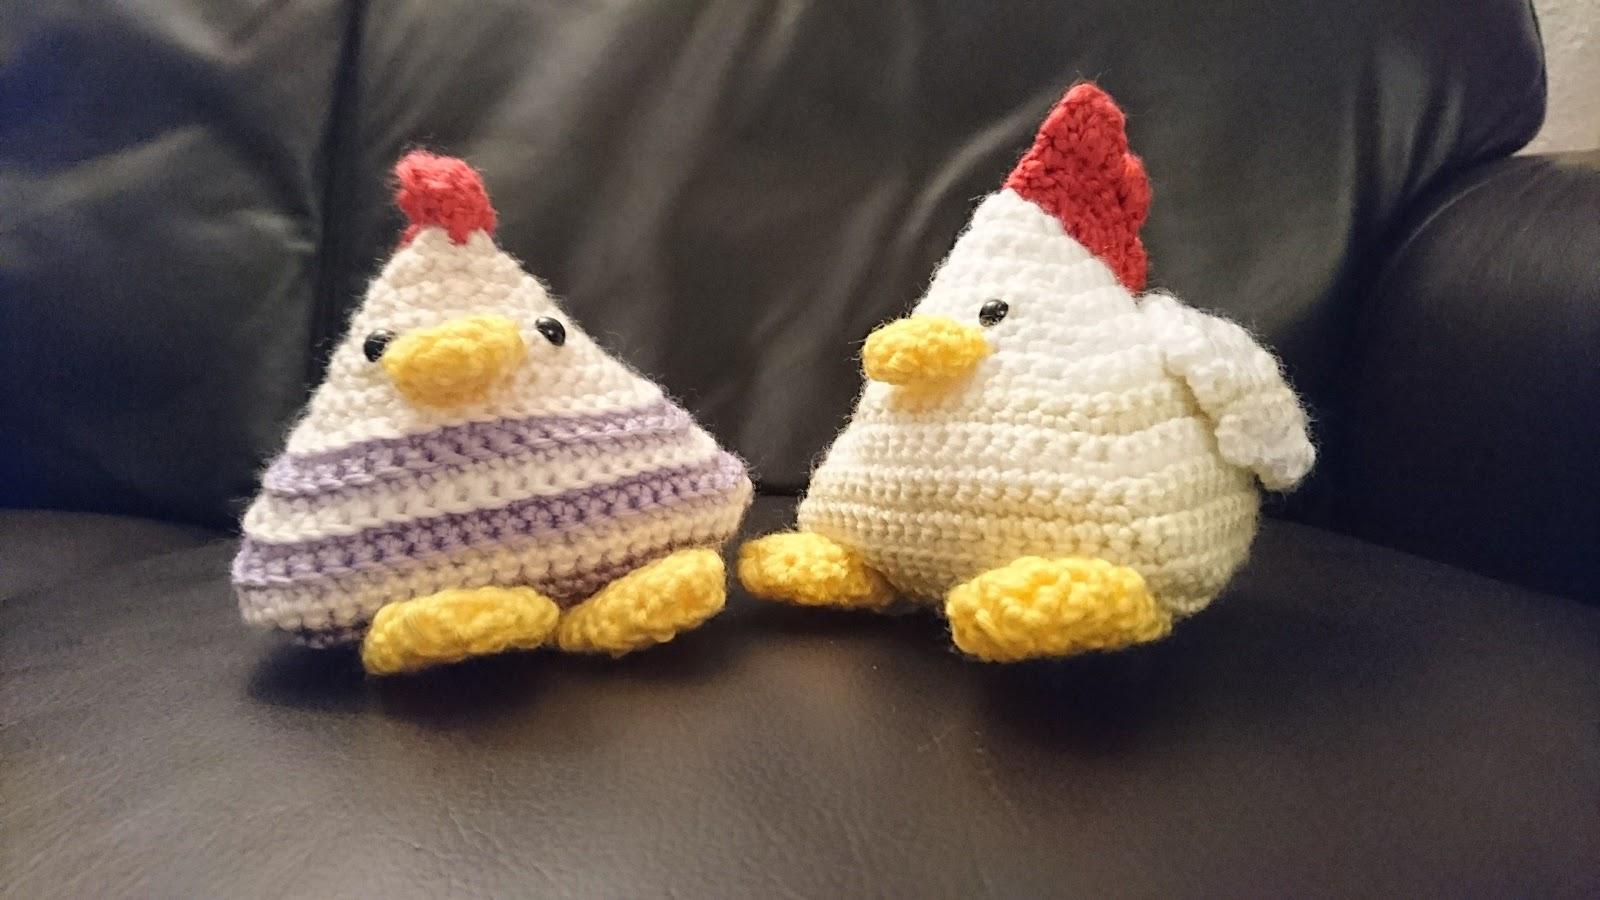 Panda can crochet: Coo-ya the chicken